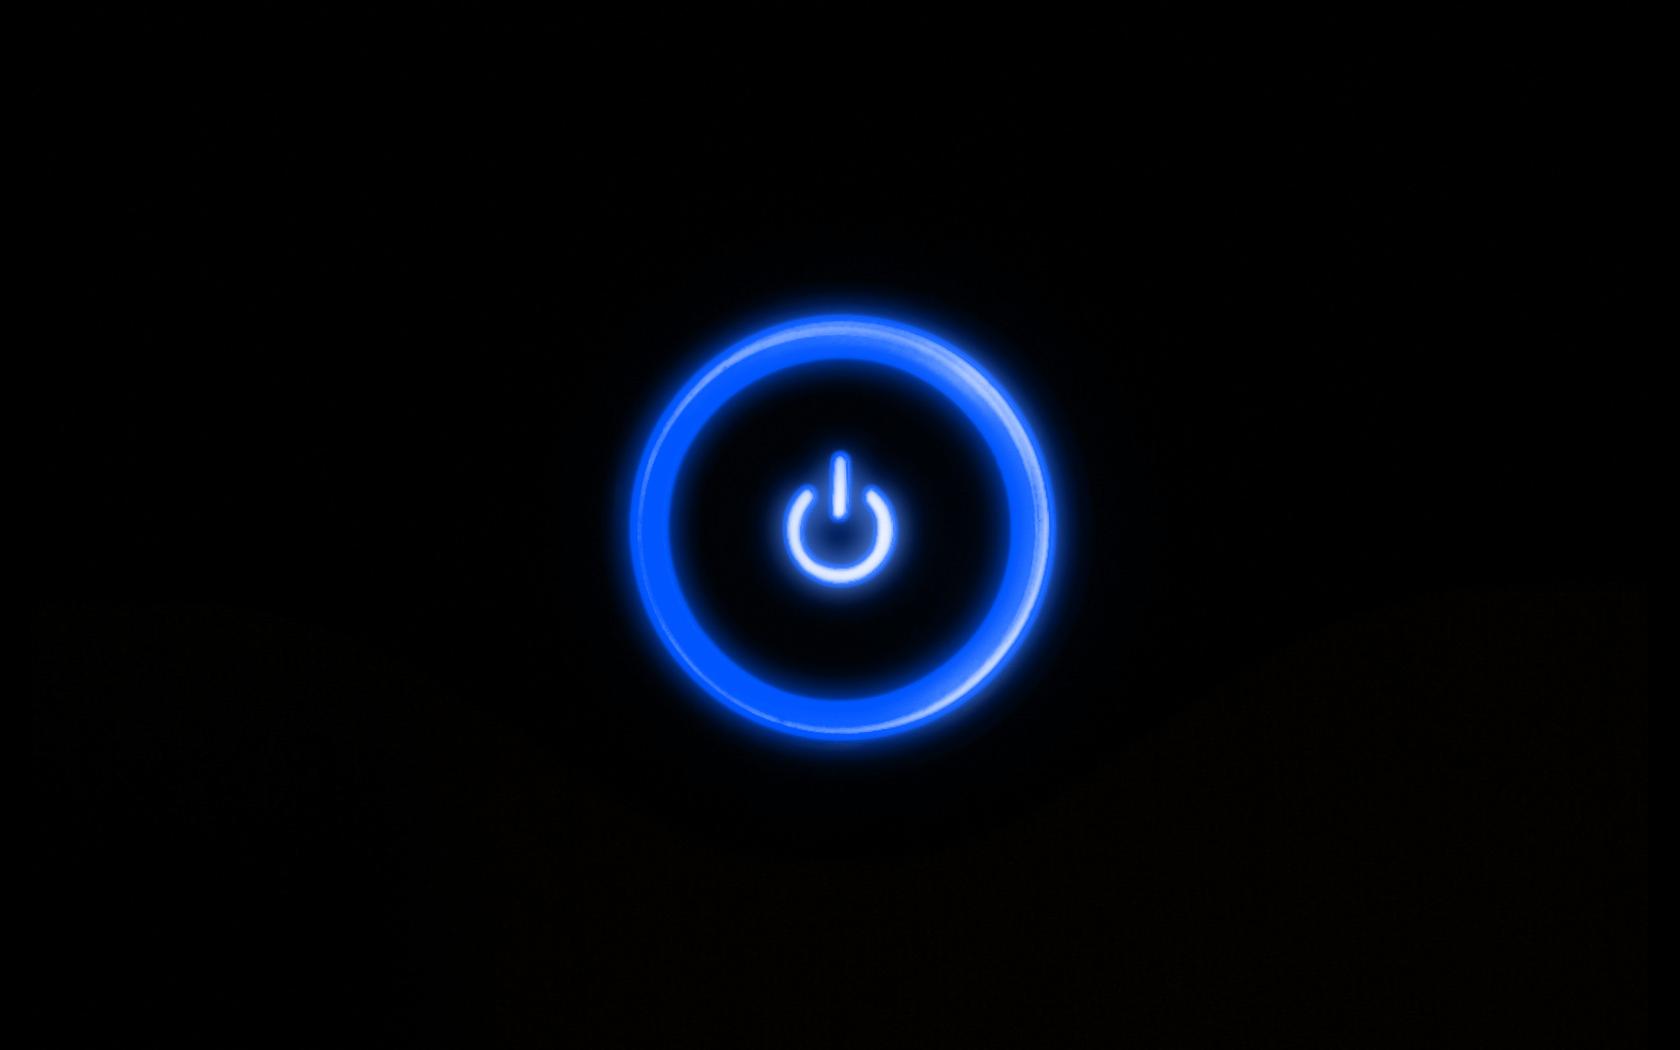 Blue Neon 16801050 Wallpaper 619053 1680x1050